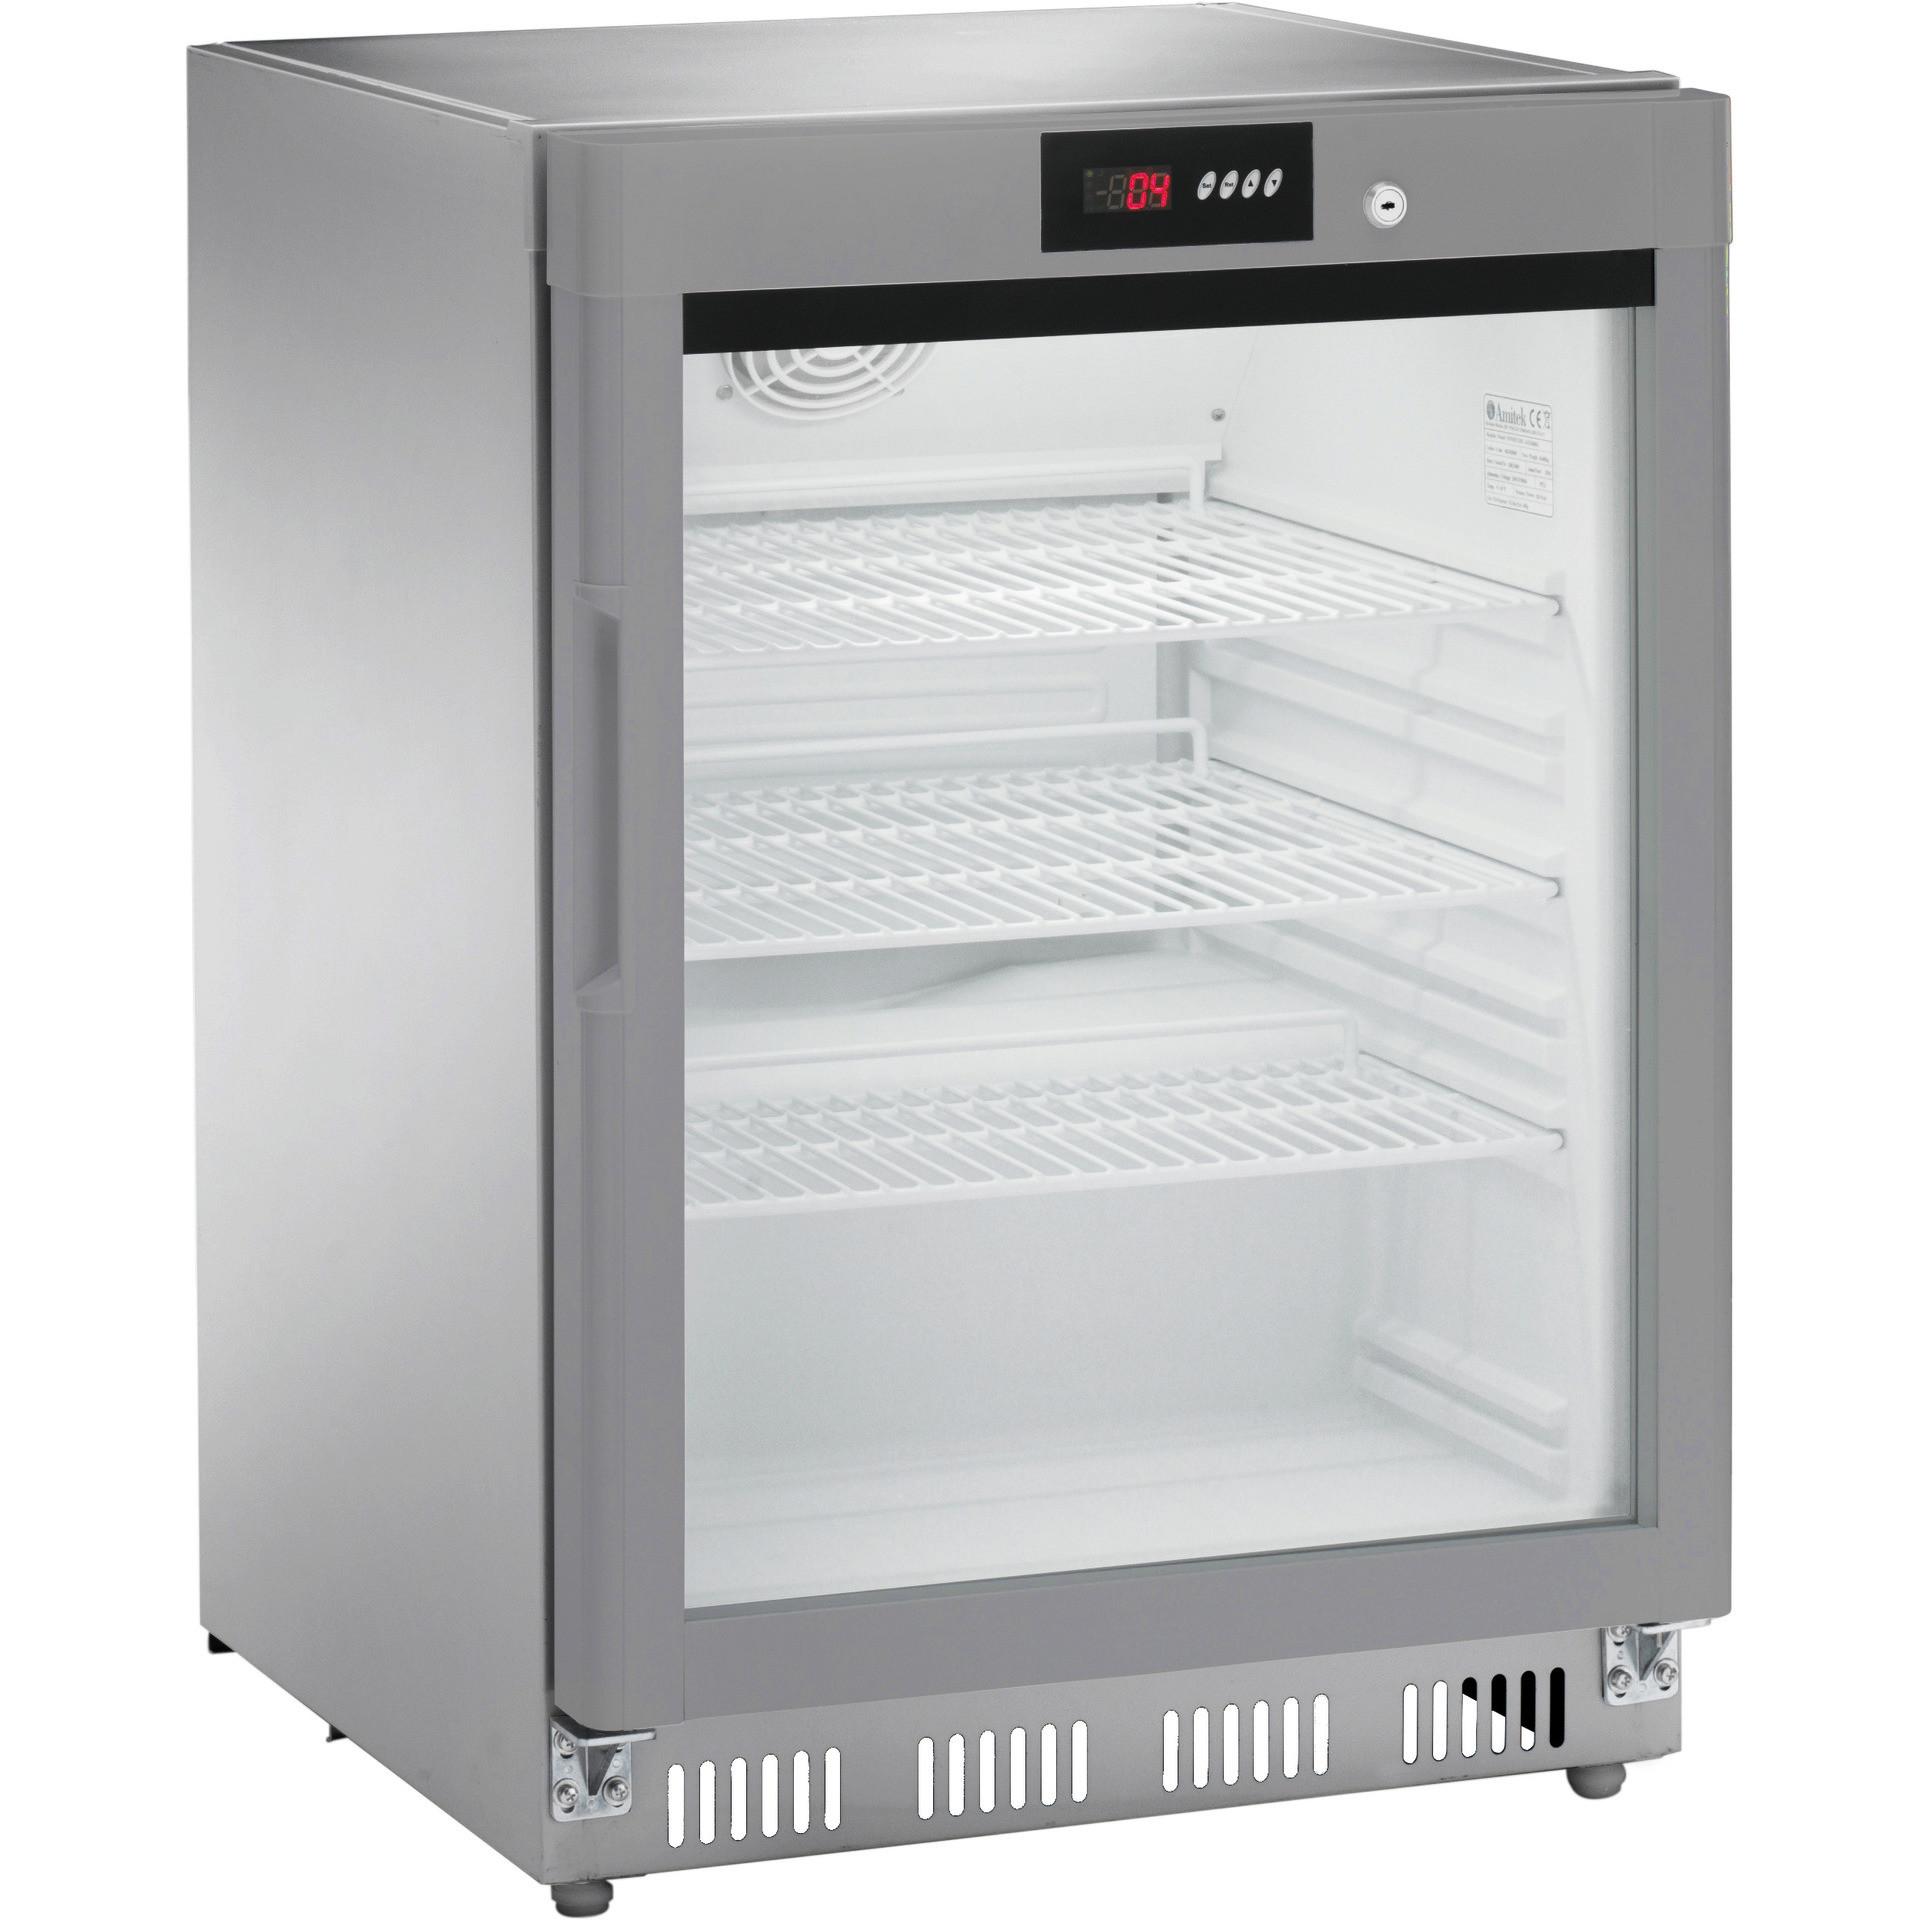 Kühlschrank Edelstahl 140 l 600 x 600 x 855 mm